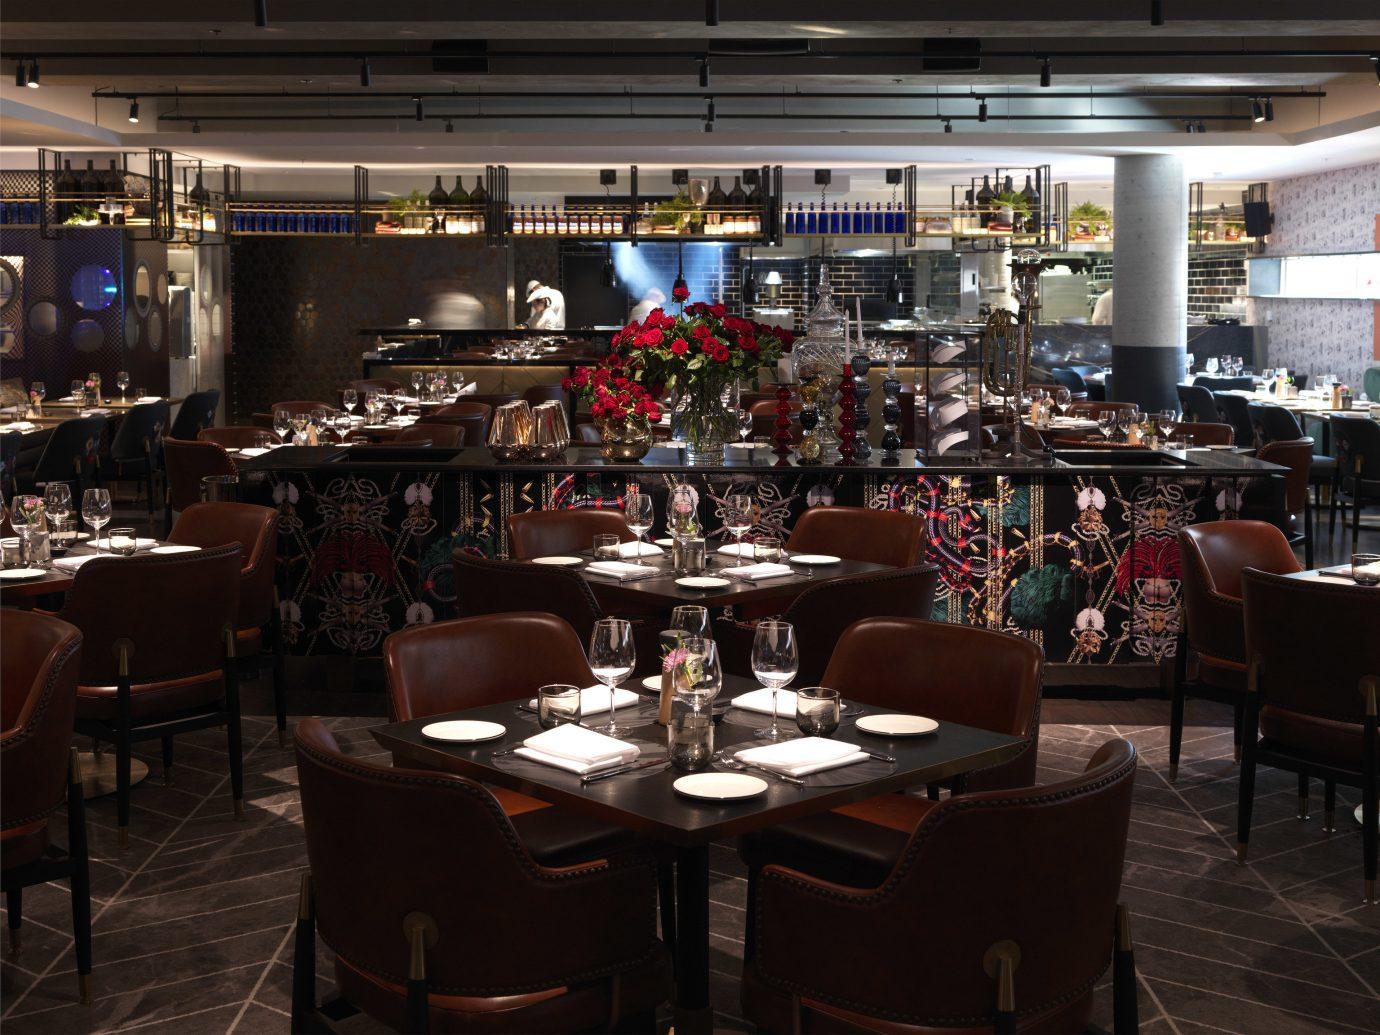 Australia Hotels Melbourne indoor table room floor ceiling chair restaurant meal interior design Bar area several